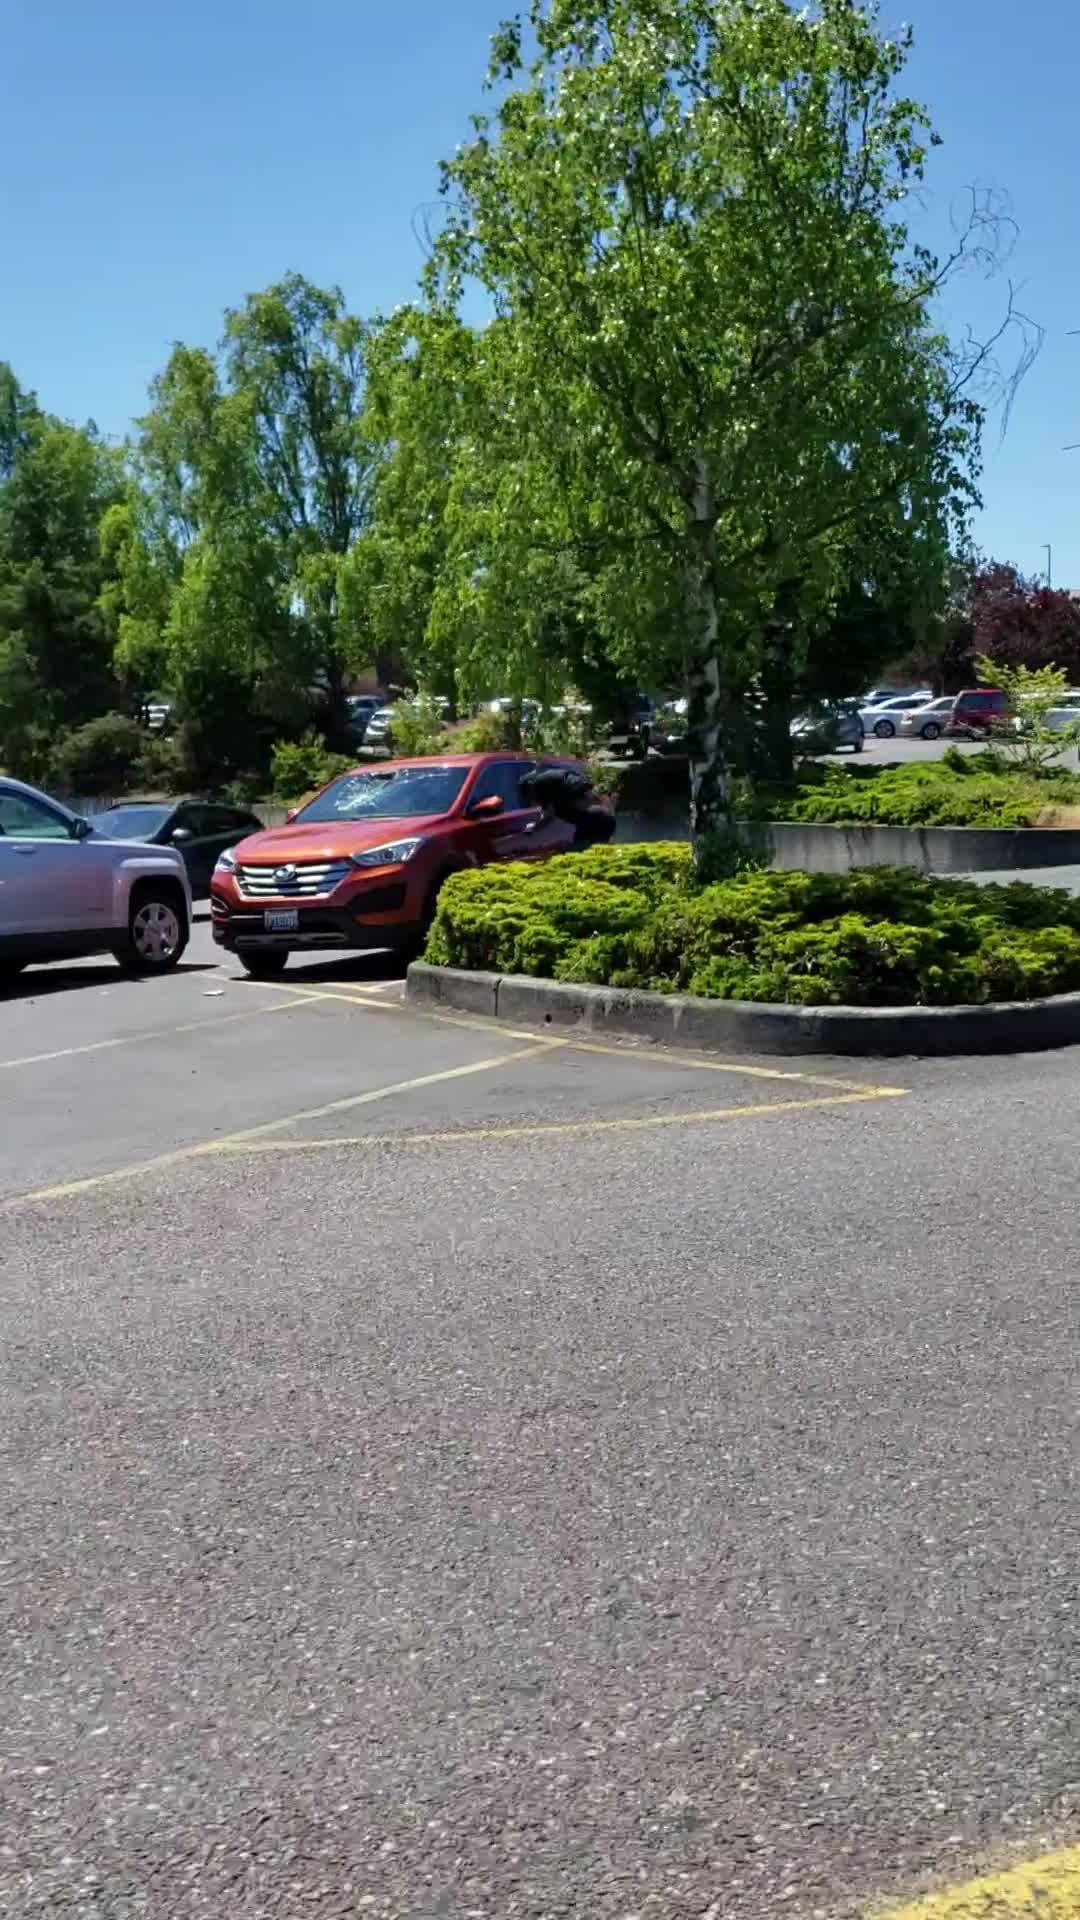 Peculiar Behavior in Parking Lot